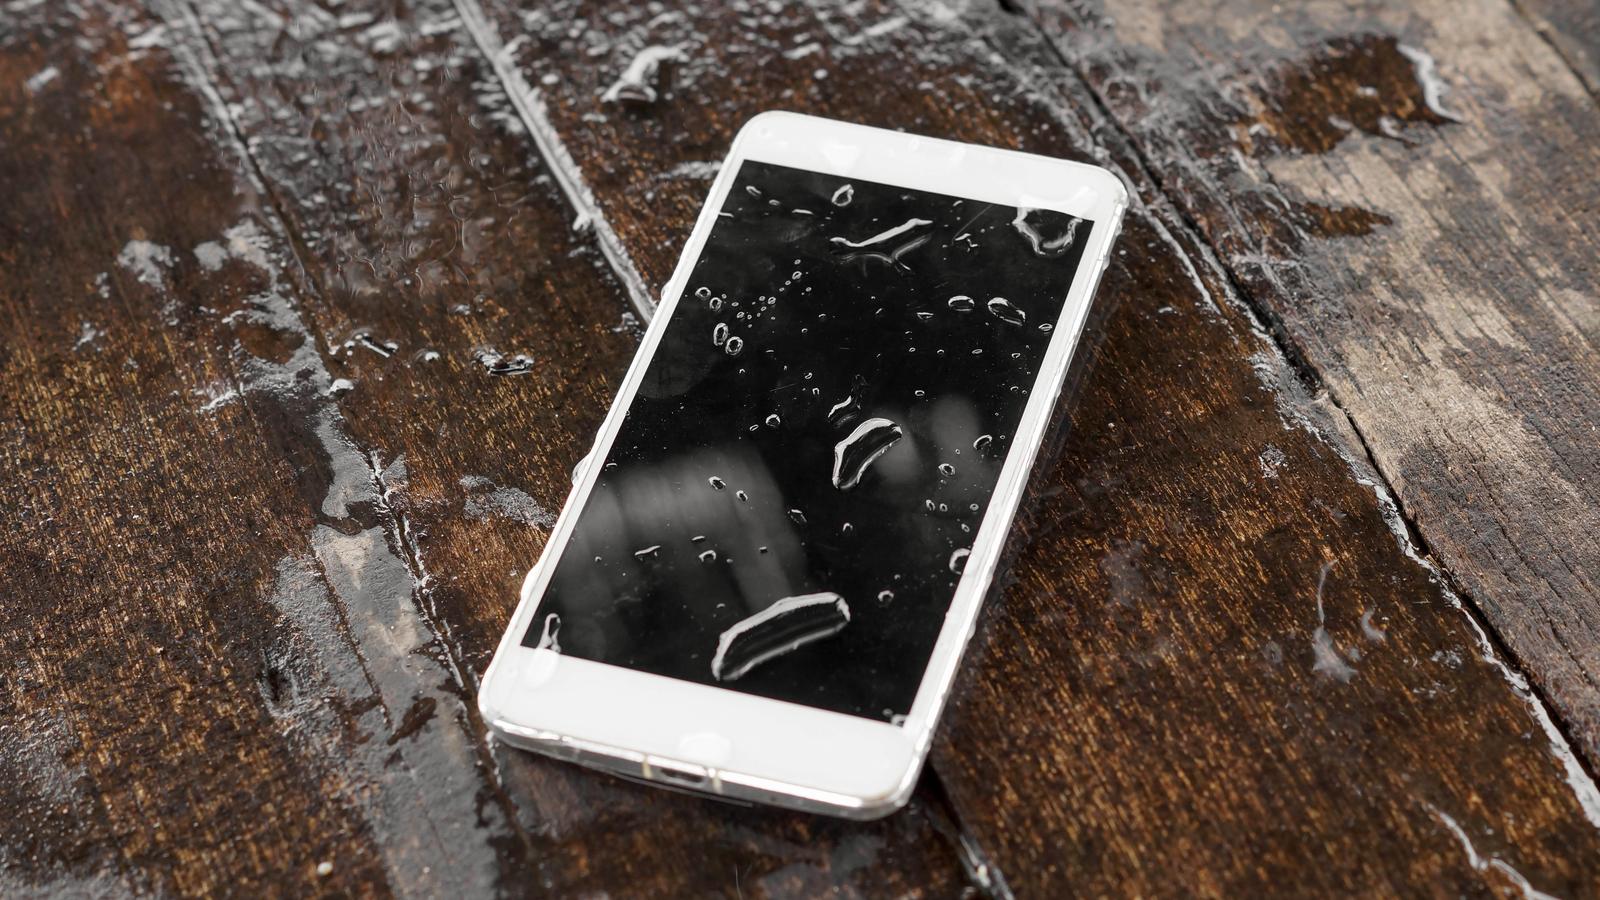 Wet smartphone on wood table